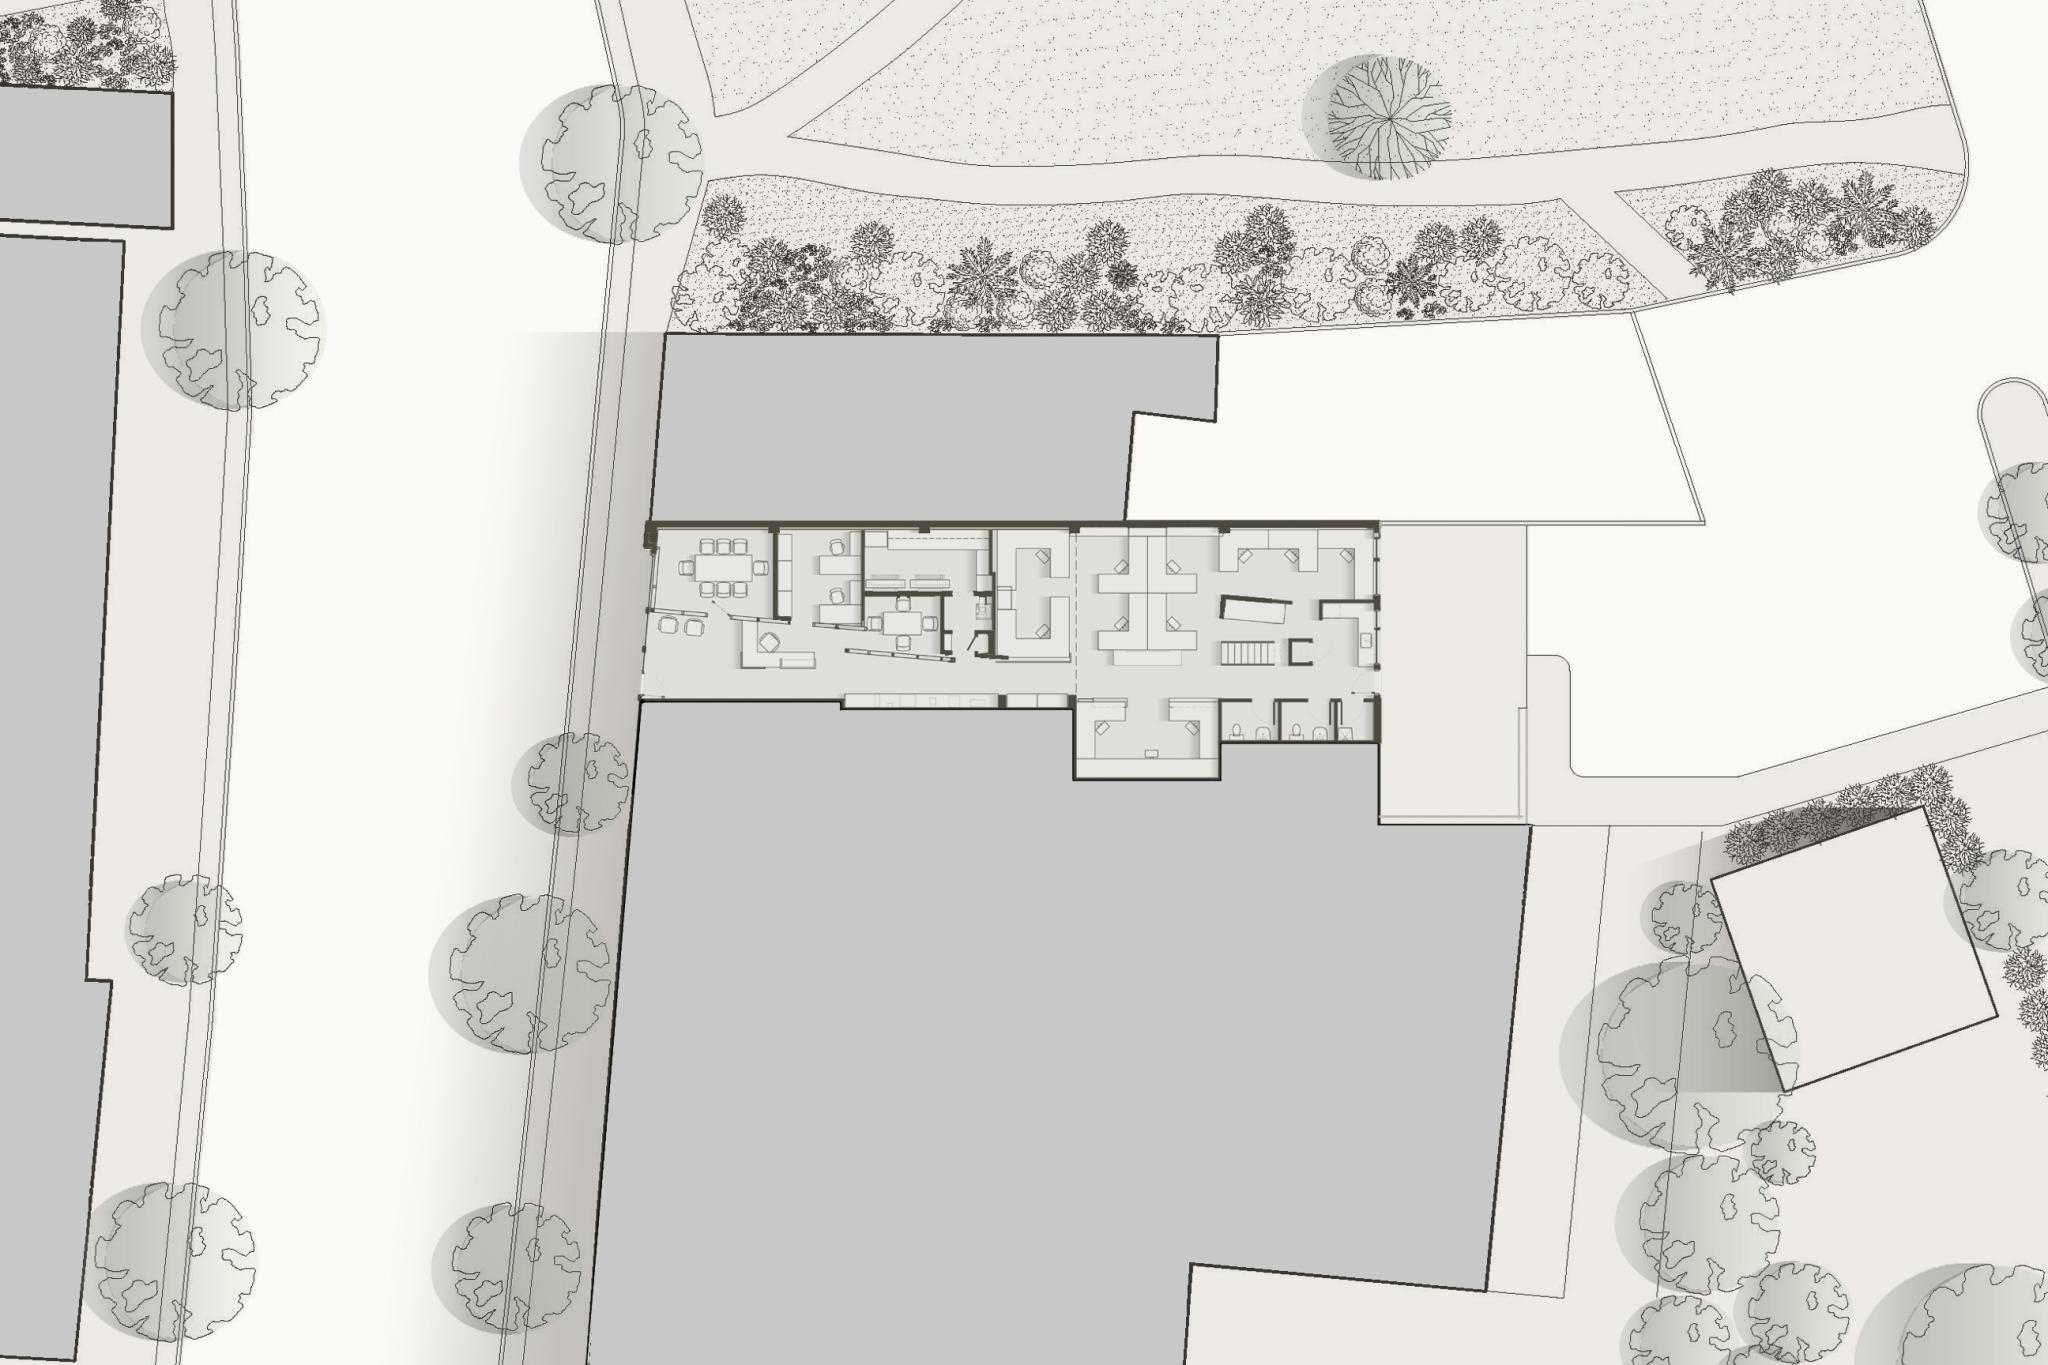 01 - Site Plan.jpg